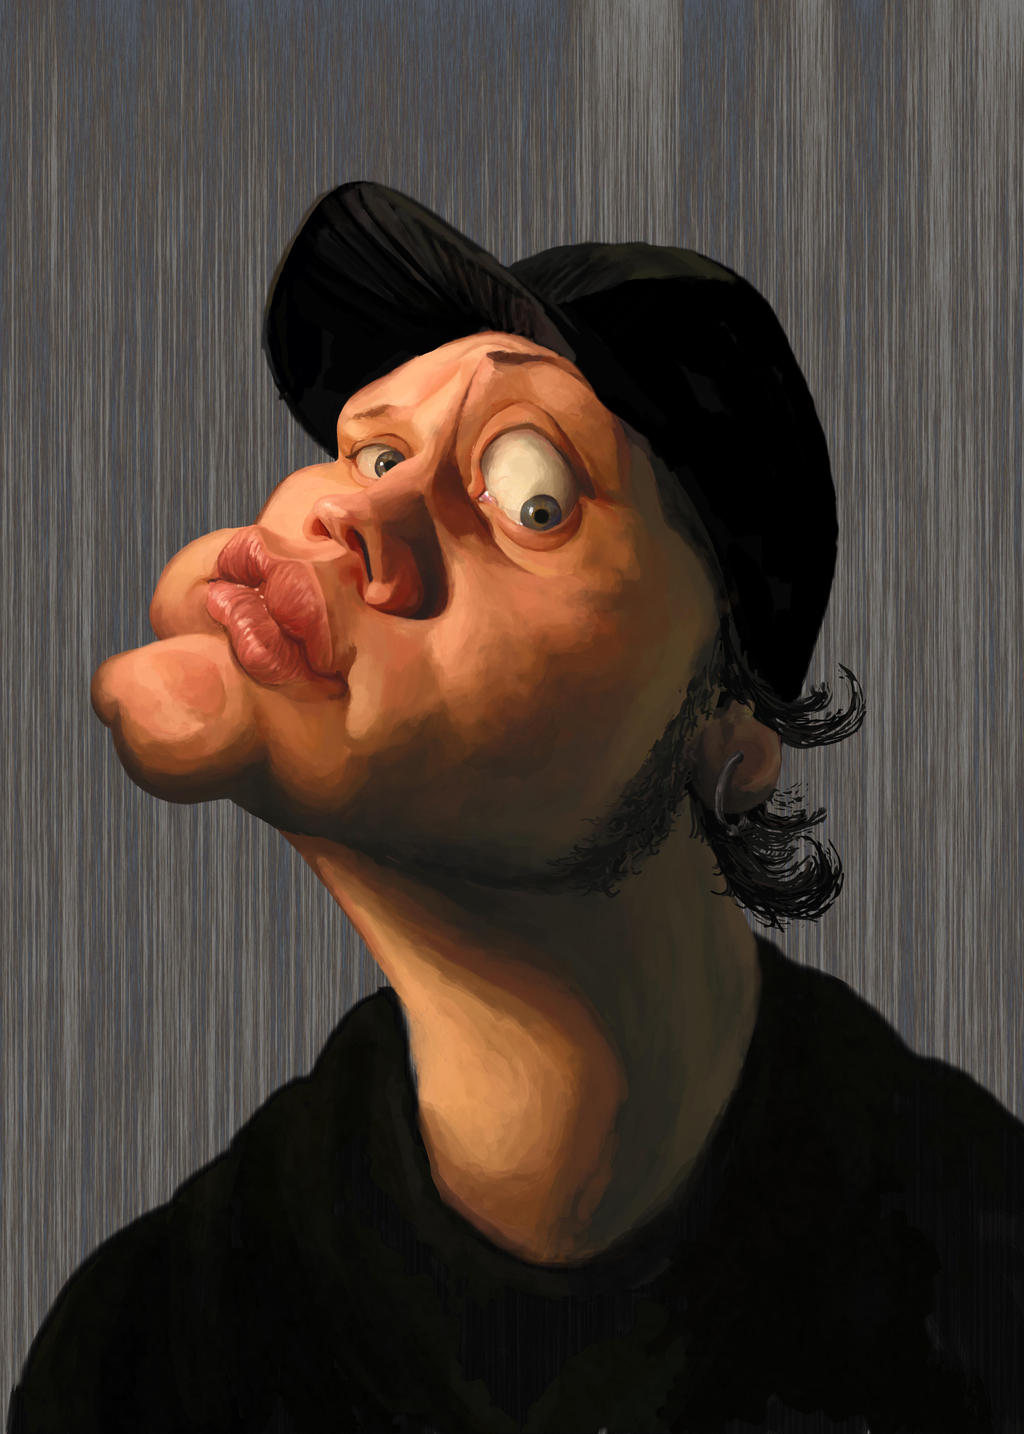 Caricaturas de famosos Self_Caricature_by_Zitman